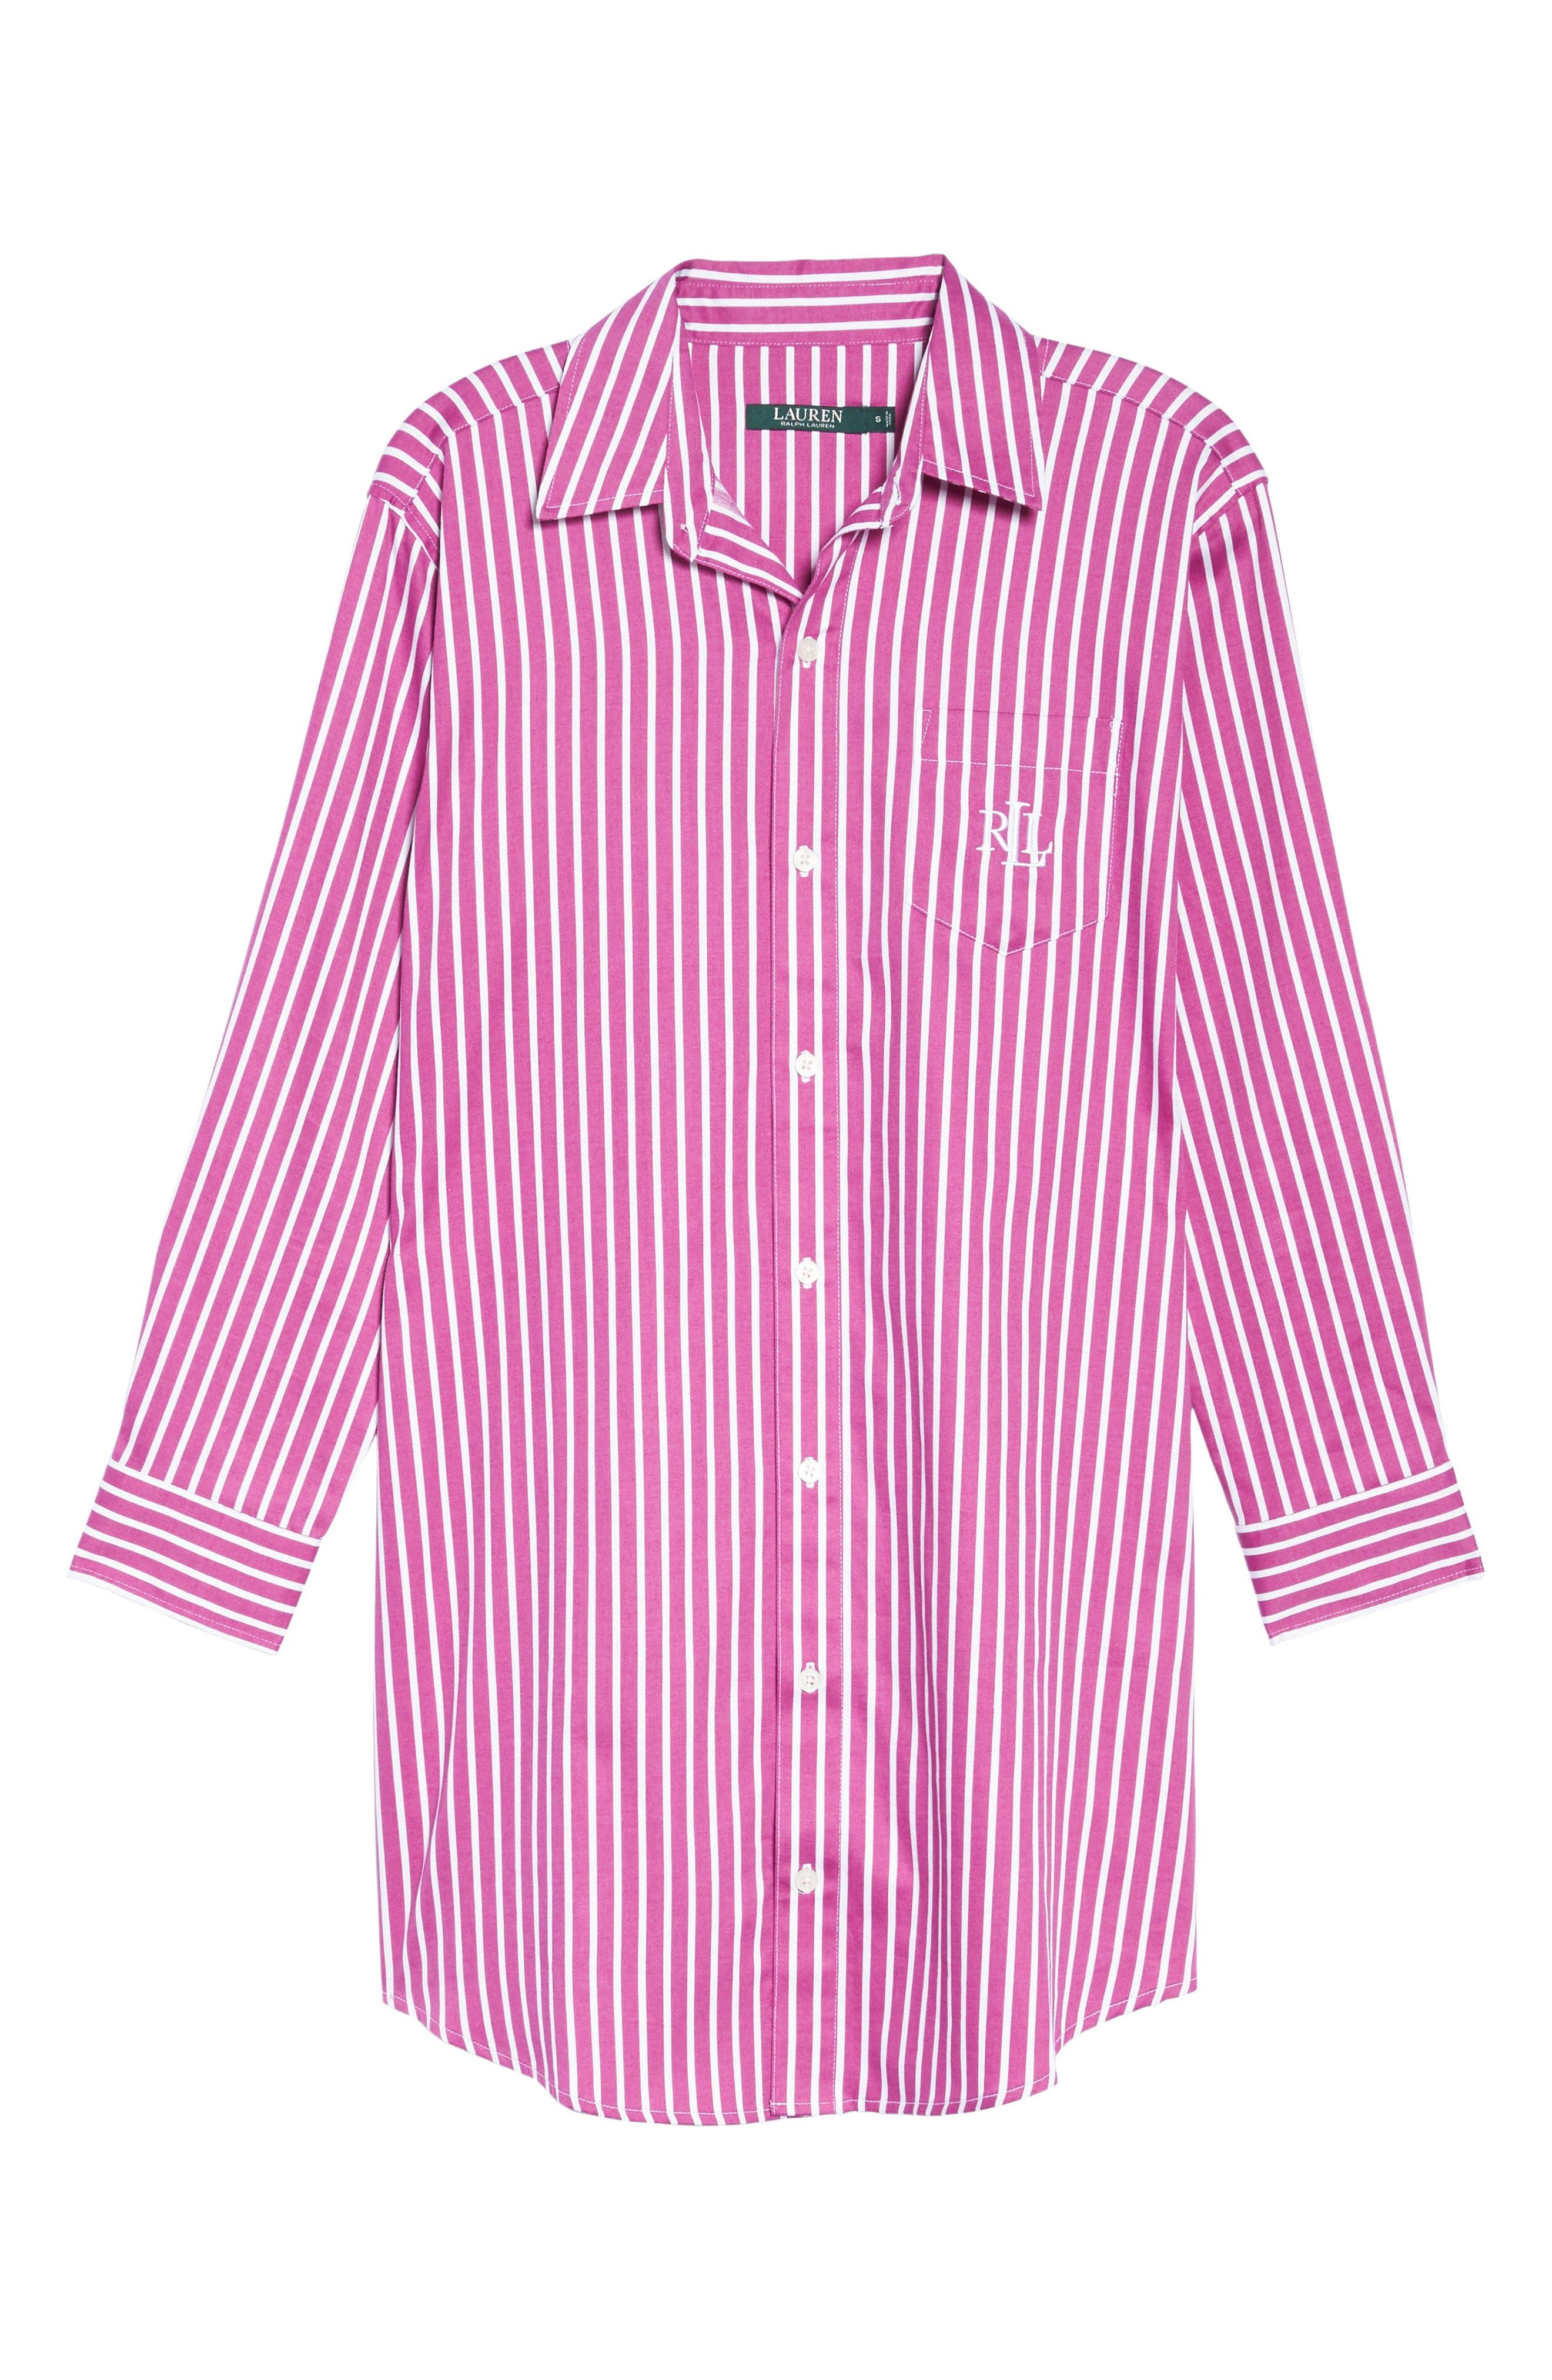 Sleep Shirt,                             Alternate thumbnail 6, color,                             Pink/ White Stripe